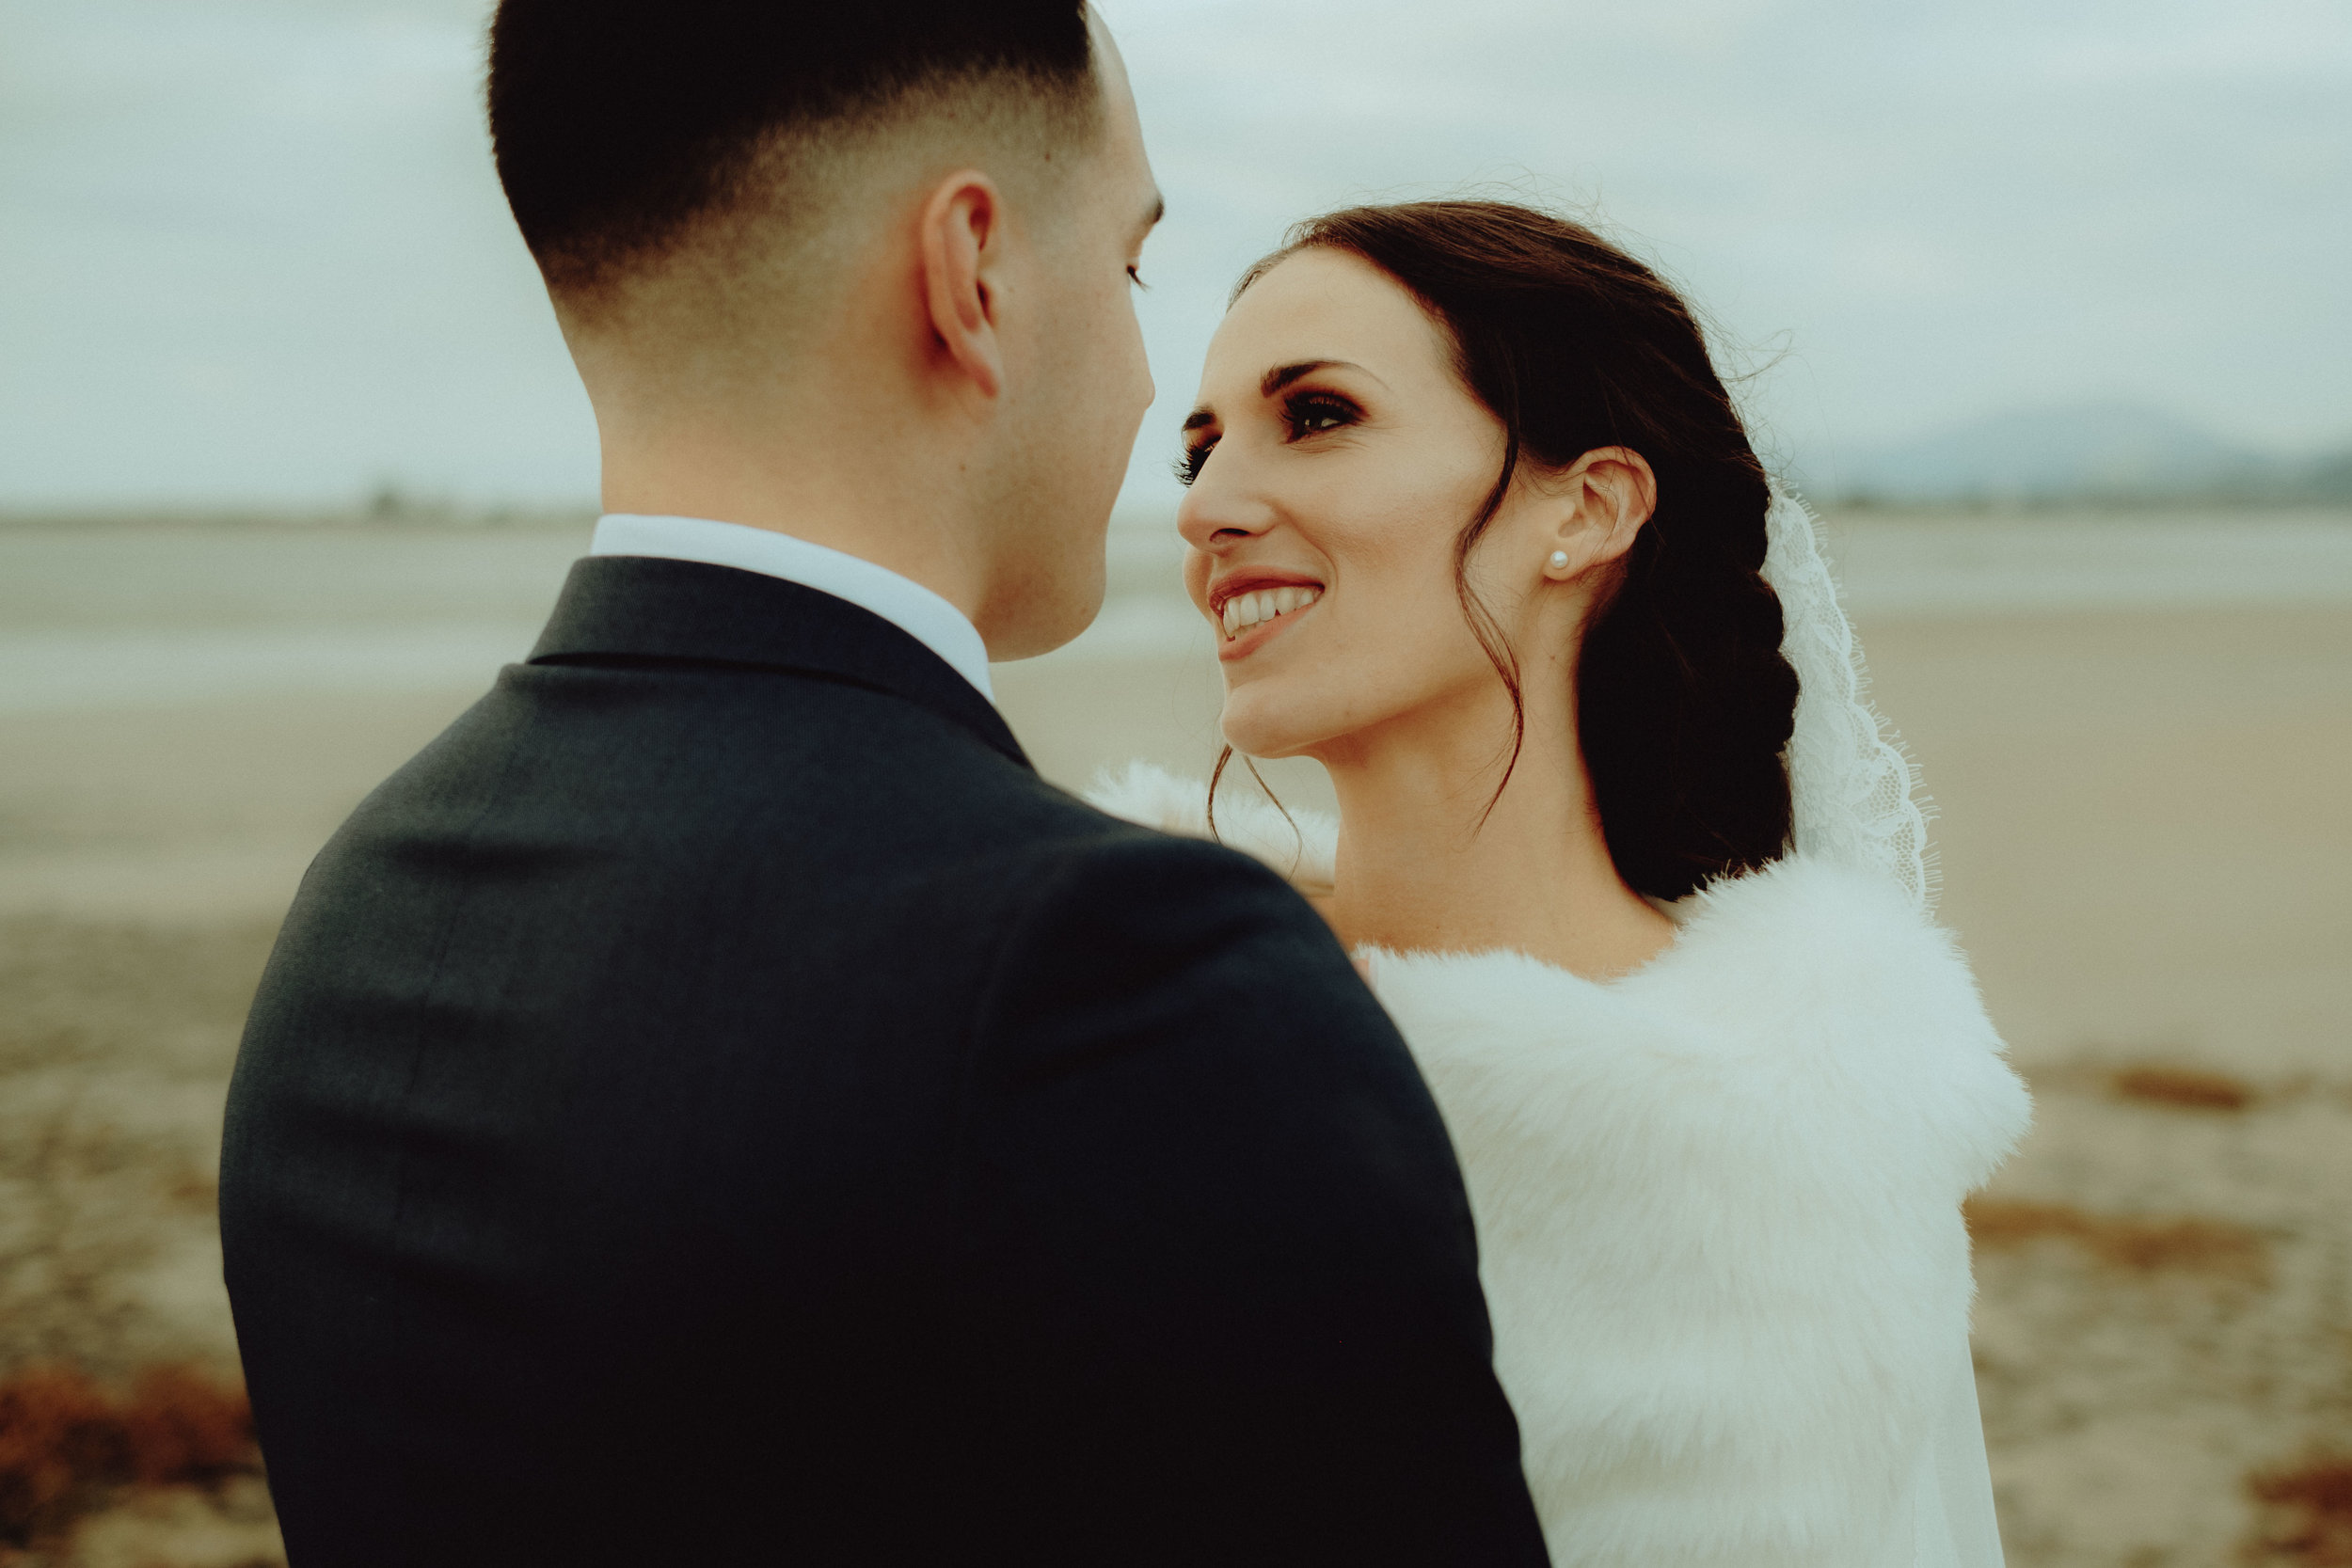 Nelson Wedding Photographer - Joshua Kirk Films